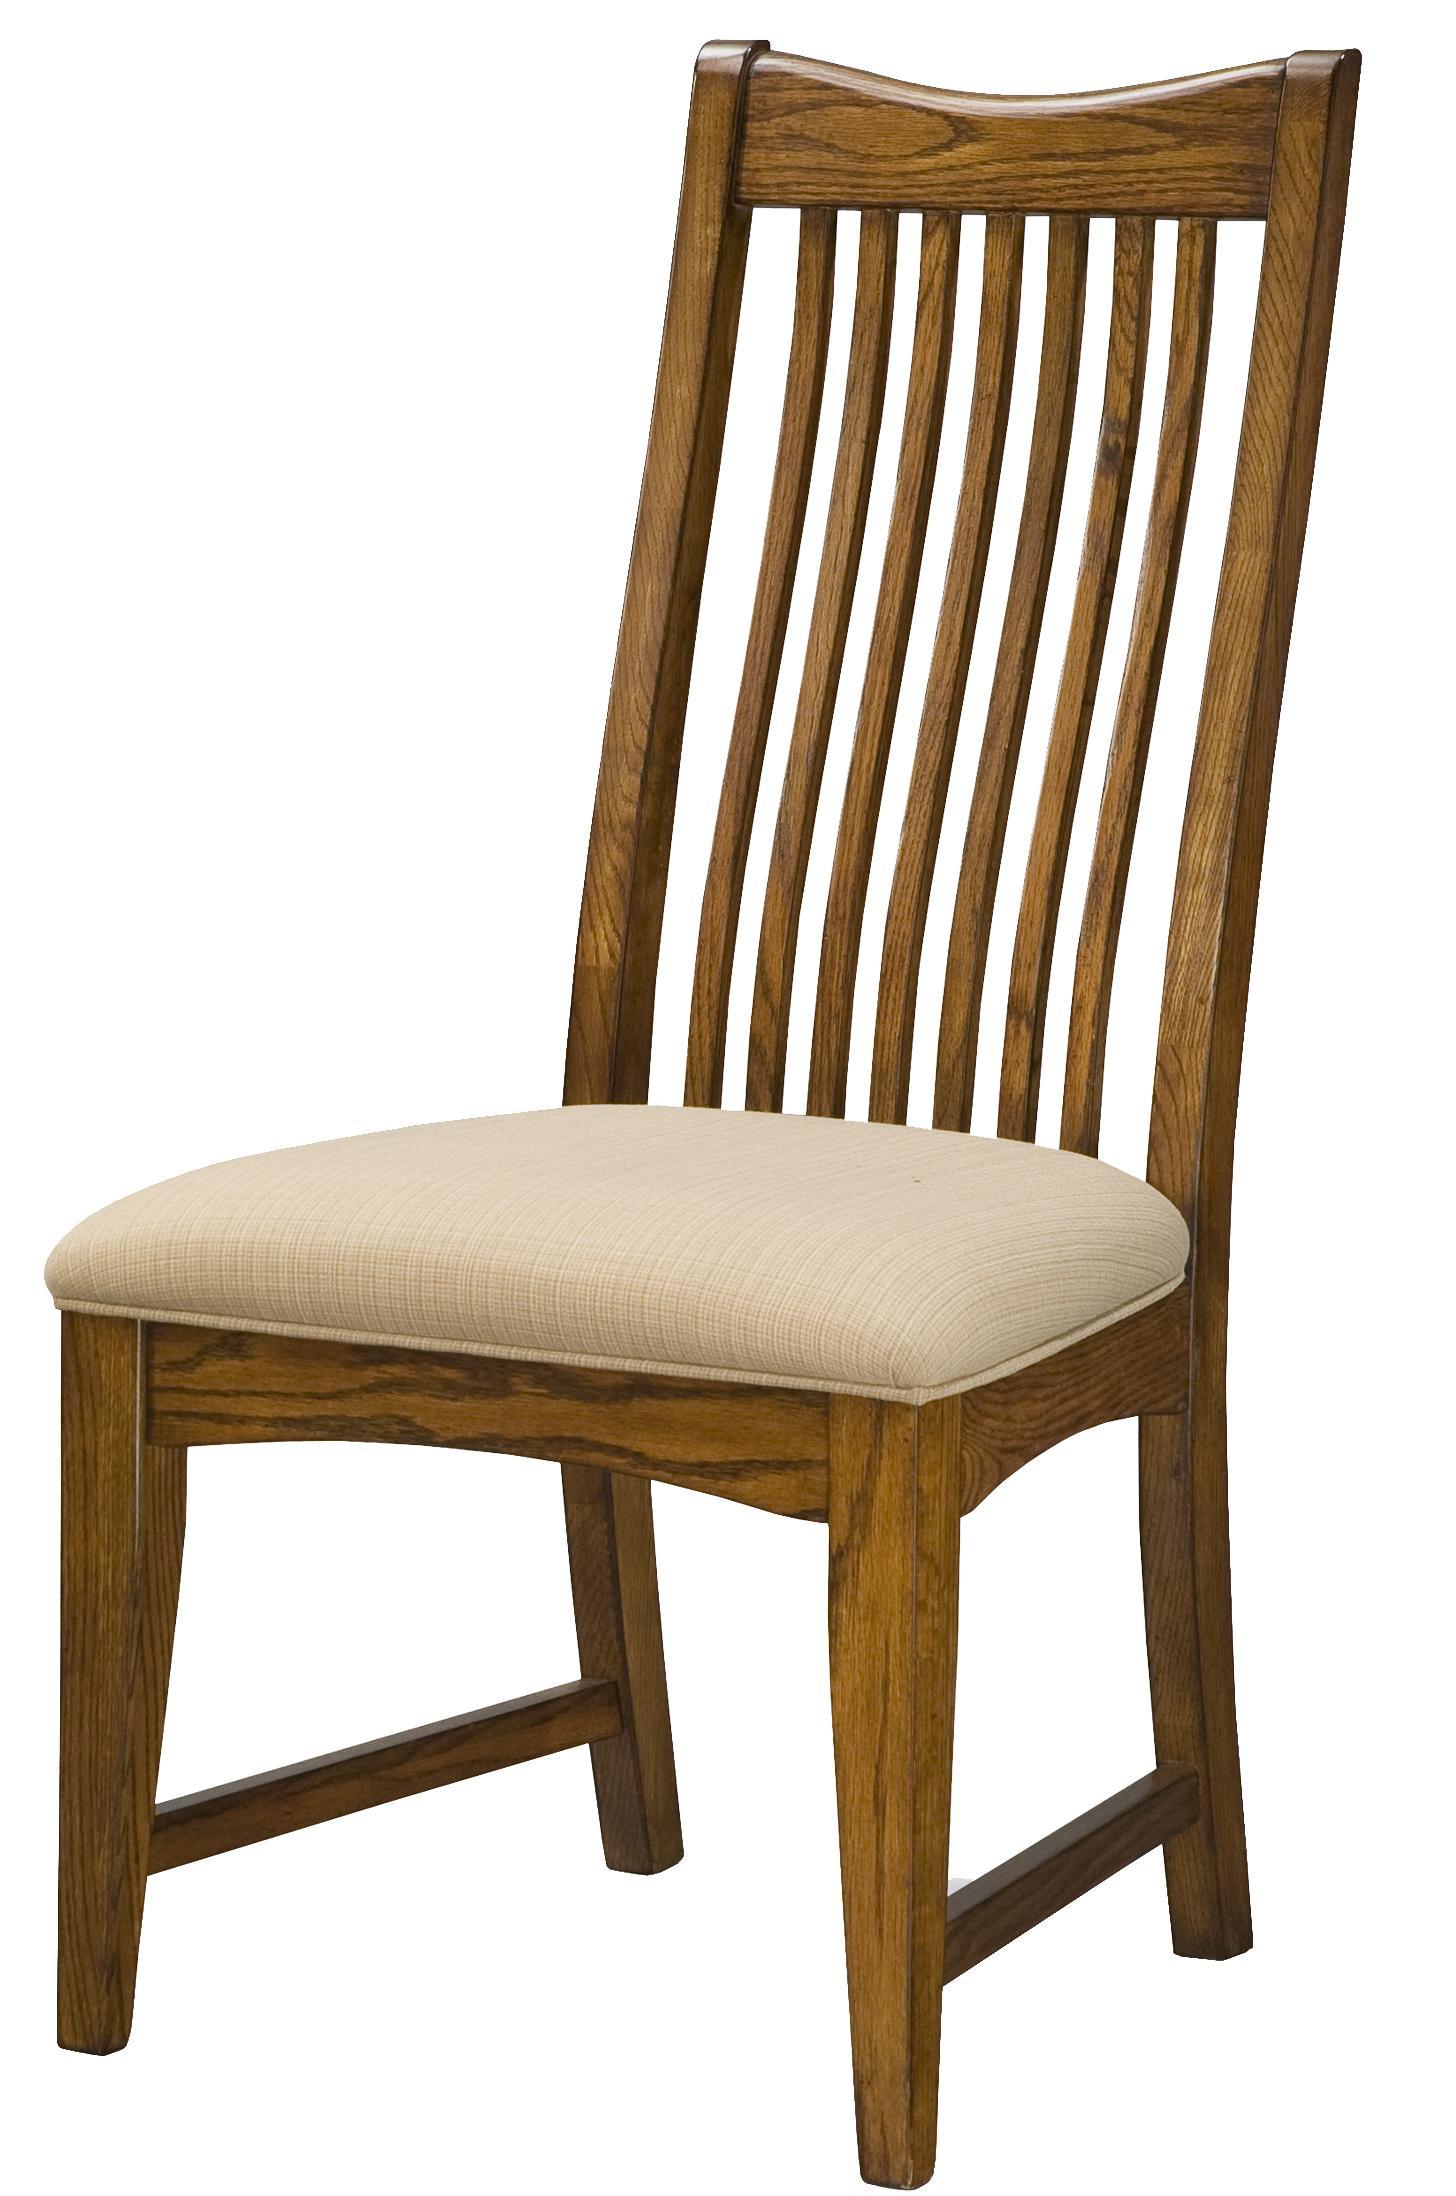 Intercon Pasadena Revival Slat Back Side Chair with  : products2Fintercon2Fcolor2Fpasadena20revival20pr br 54pr ch 1050c mbn rta b0 from www.furnops.com size 1456 x 2196 jpeg 251kB